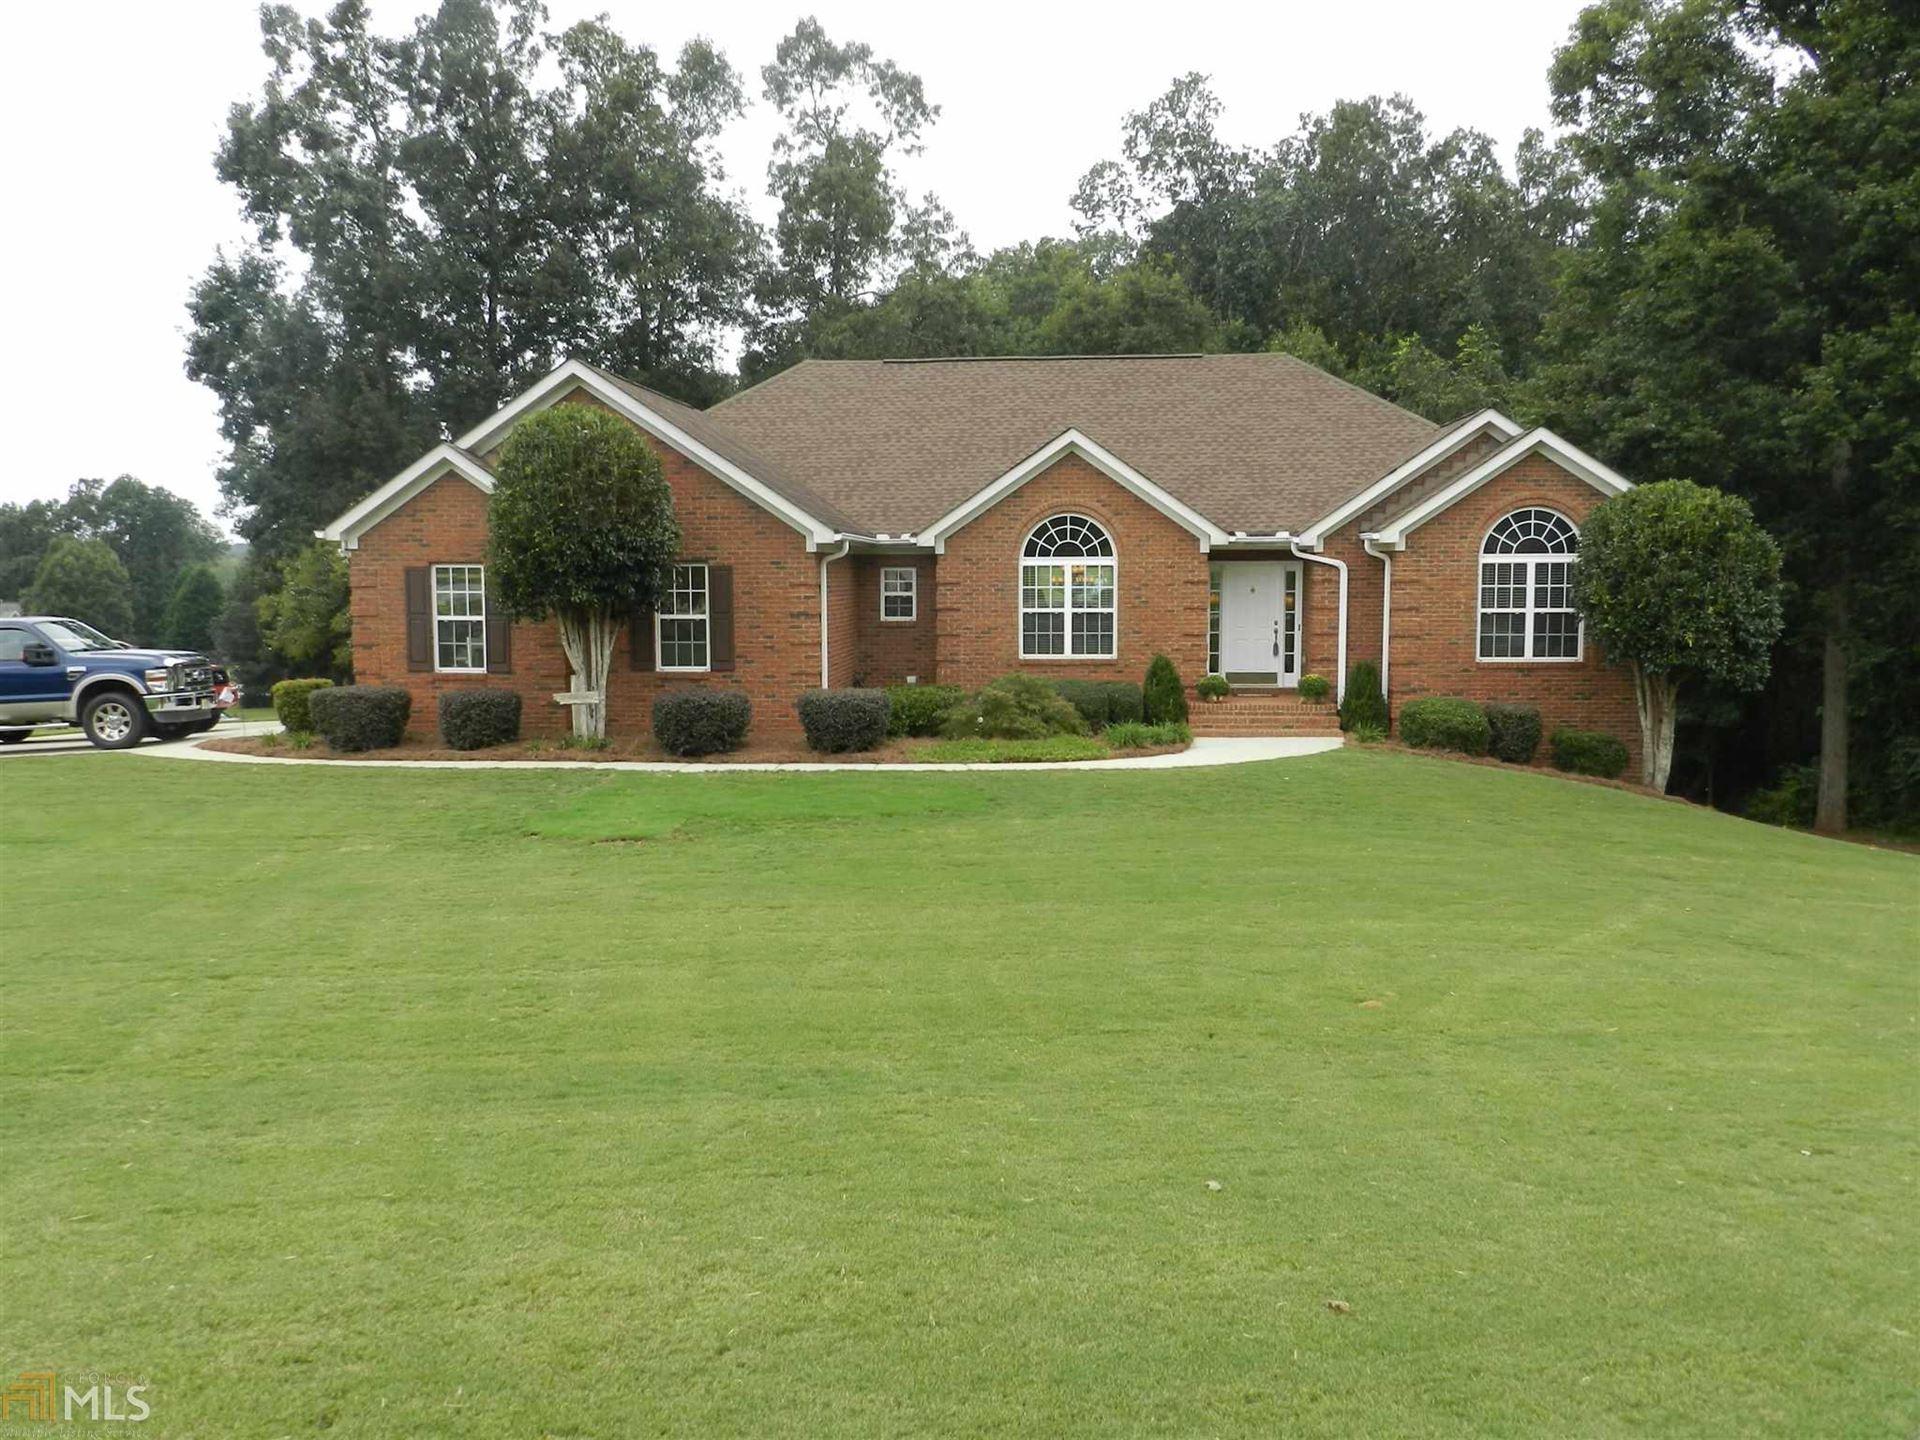 1107 Huntcrest Ridge, McDonough, GA 30252 - #: 8858539